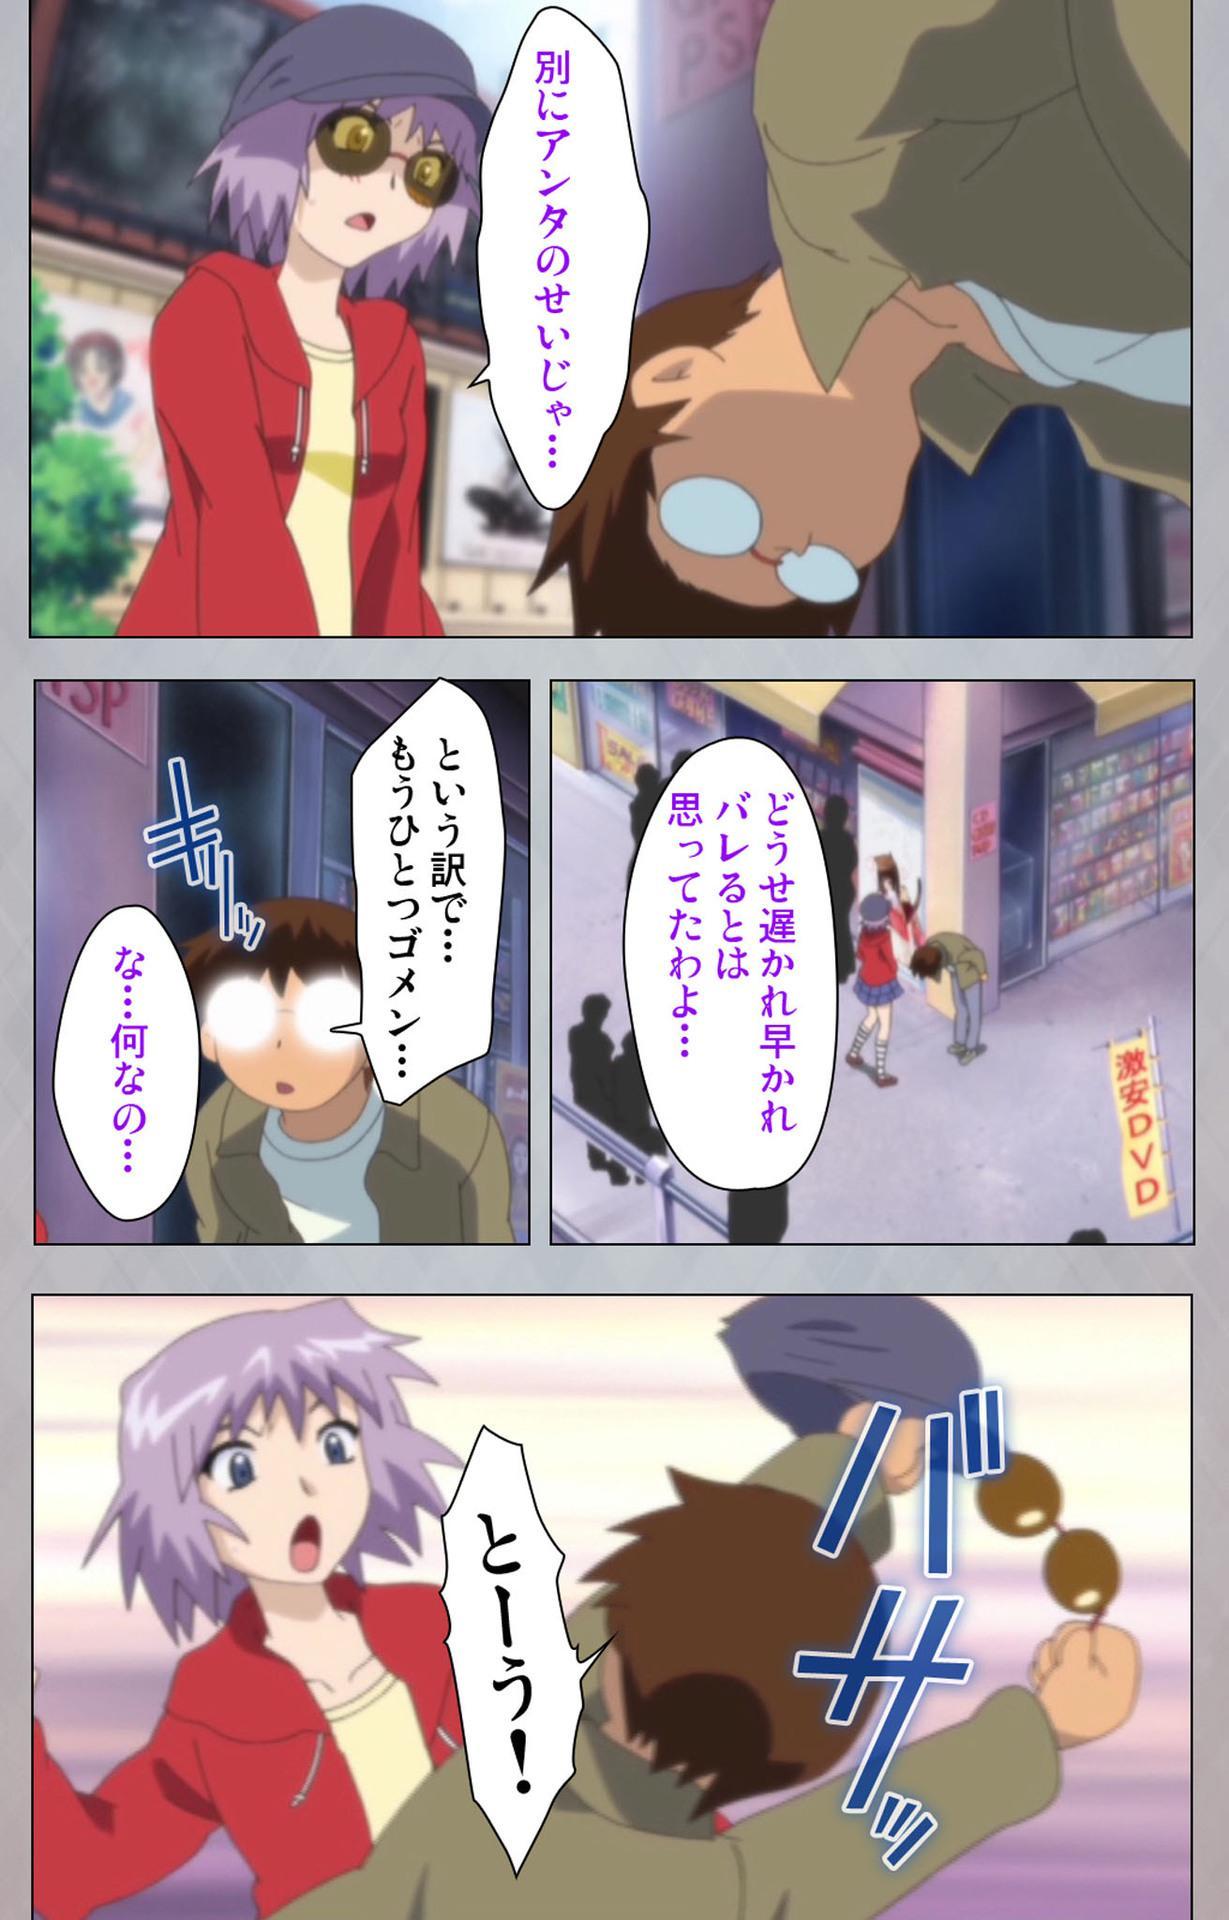 [Digital Works] [Full Color Seijin Ban] Sex Android ~Risou no Onna de Nuite yaru~ Kanzenban 180